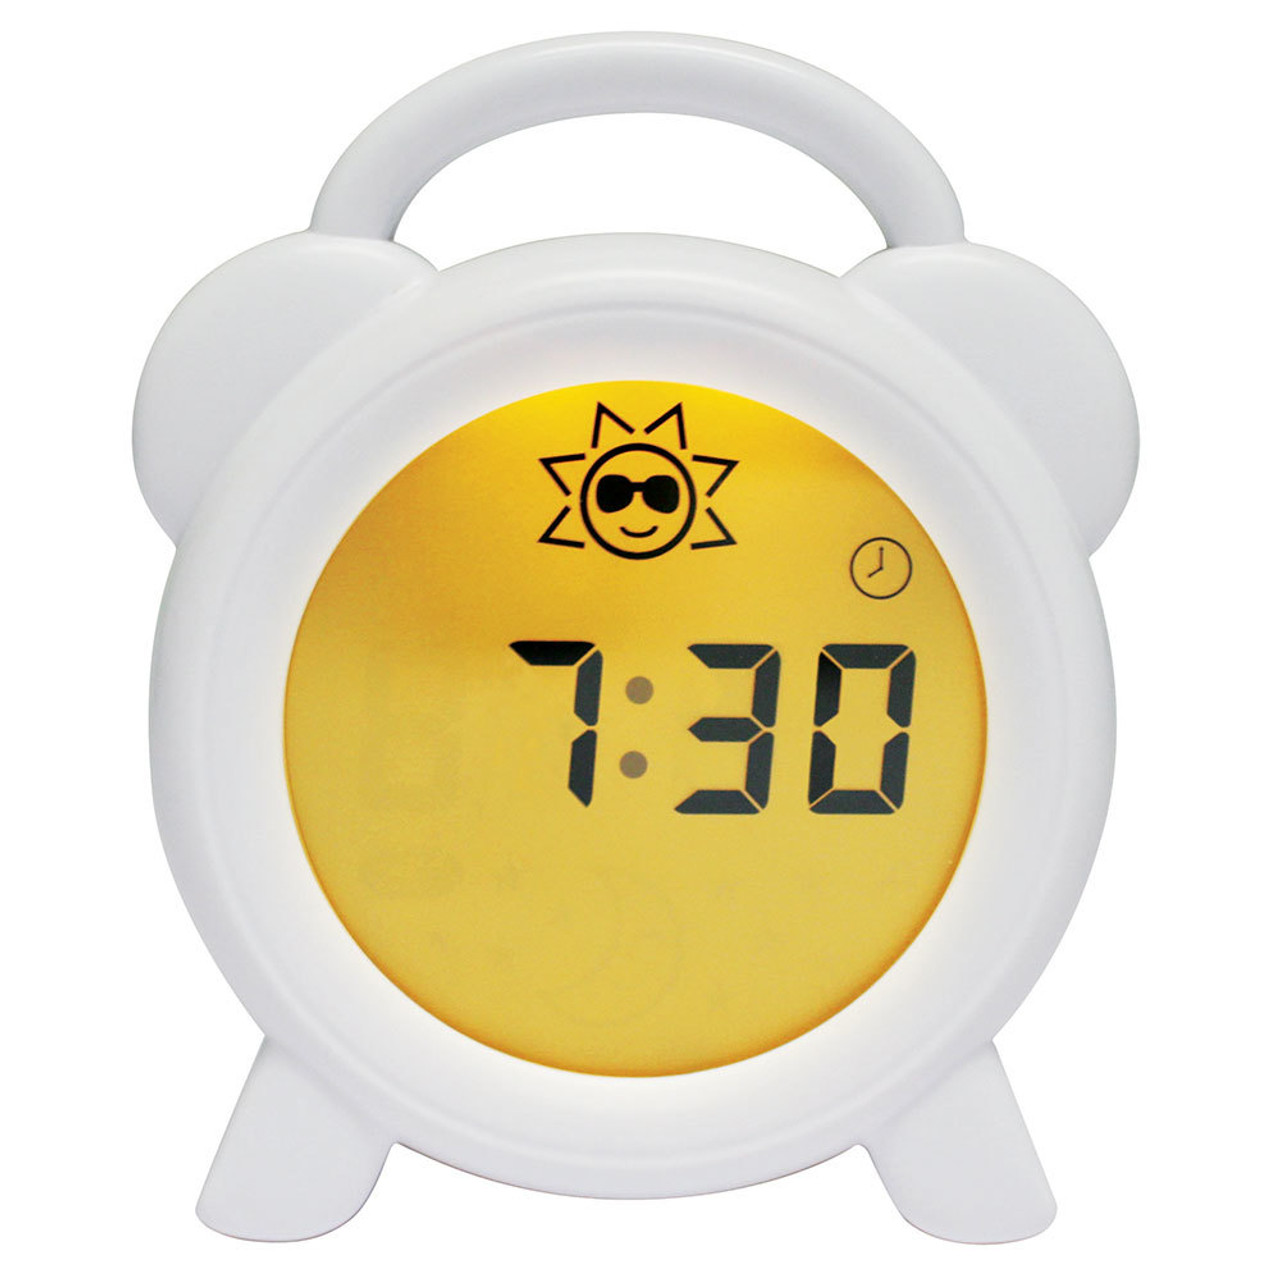 Roger Armstrong Sleep Trainer Clock